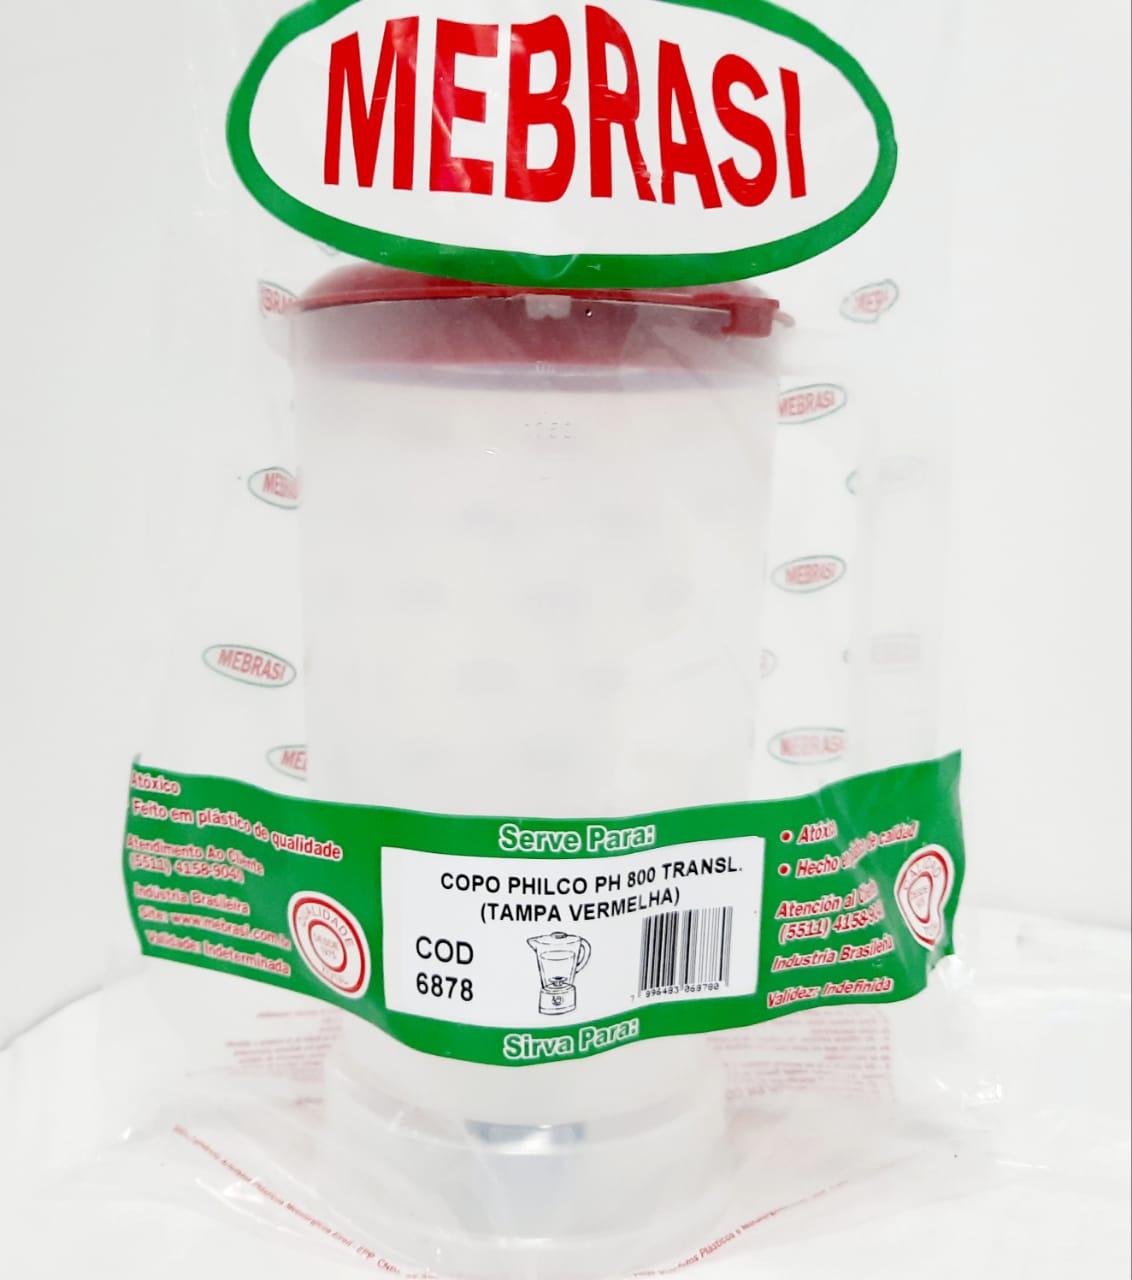 Copo Philco TRAN PH 800 VERM - Mebrasi